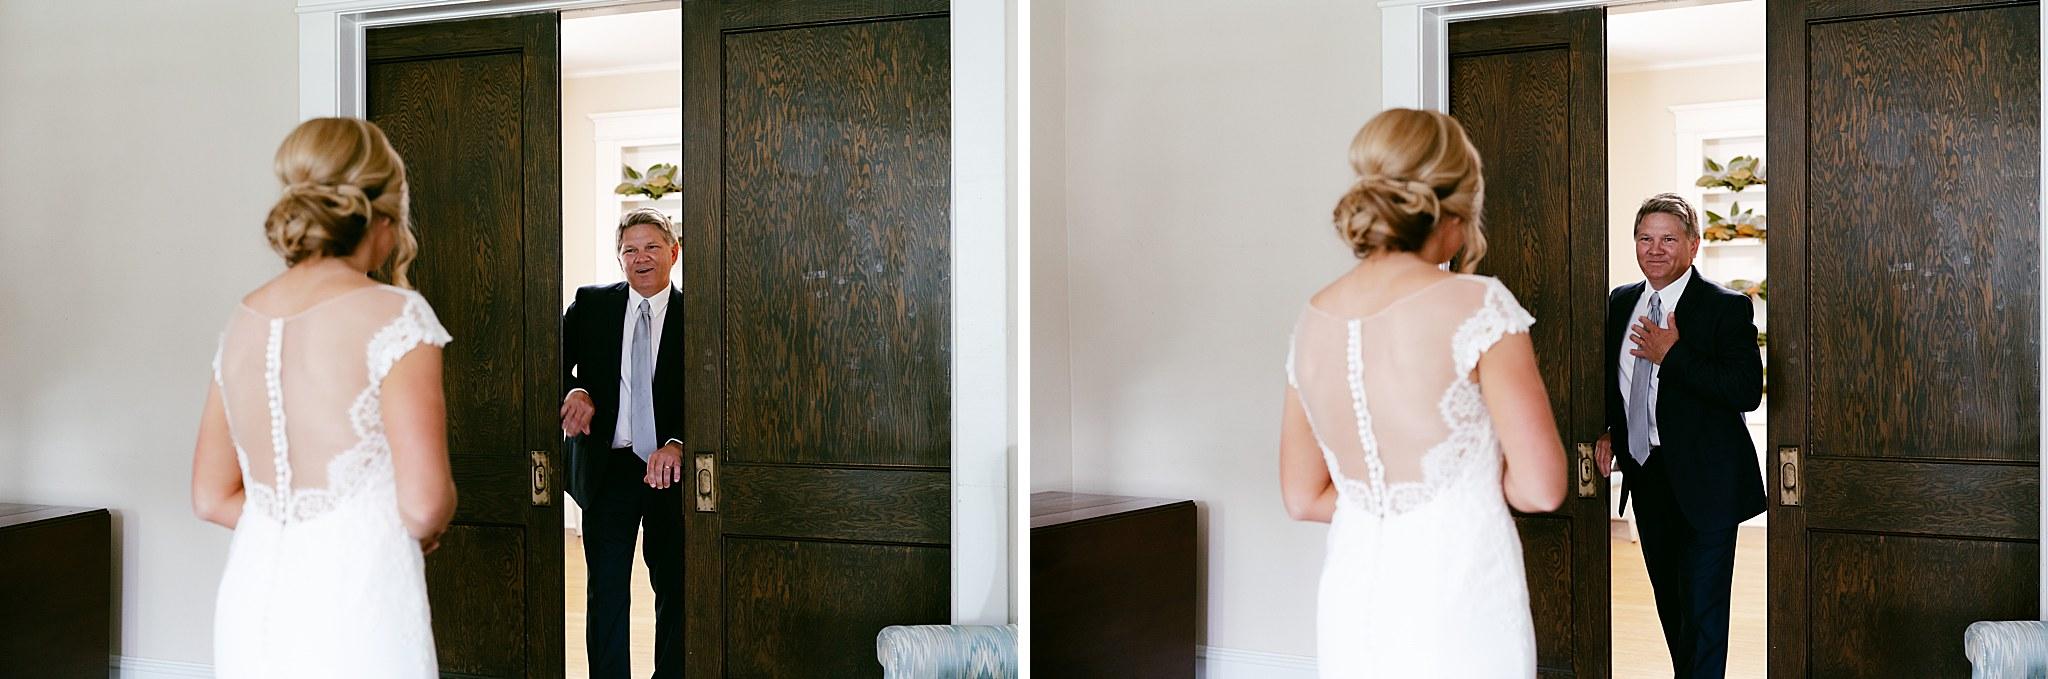 Williamston-NC-Wedding-Photographer 0012.jpg